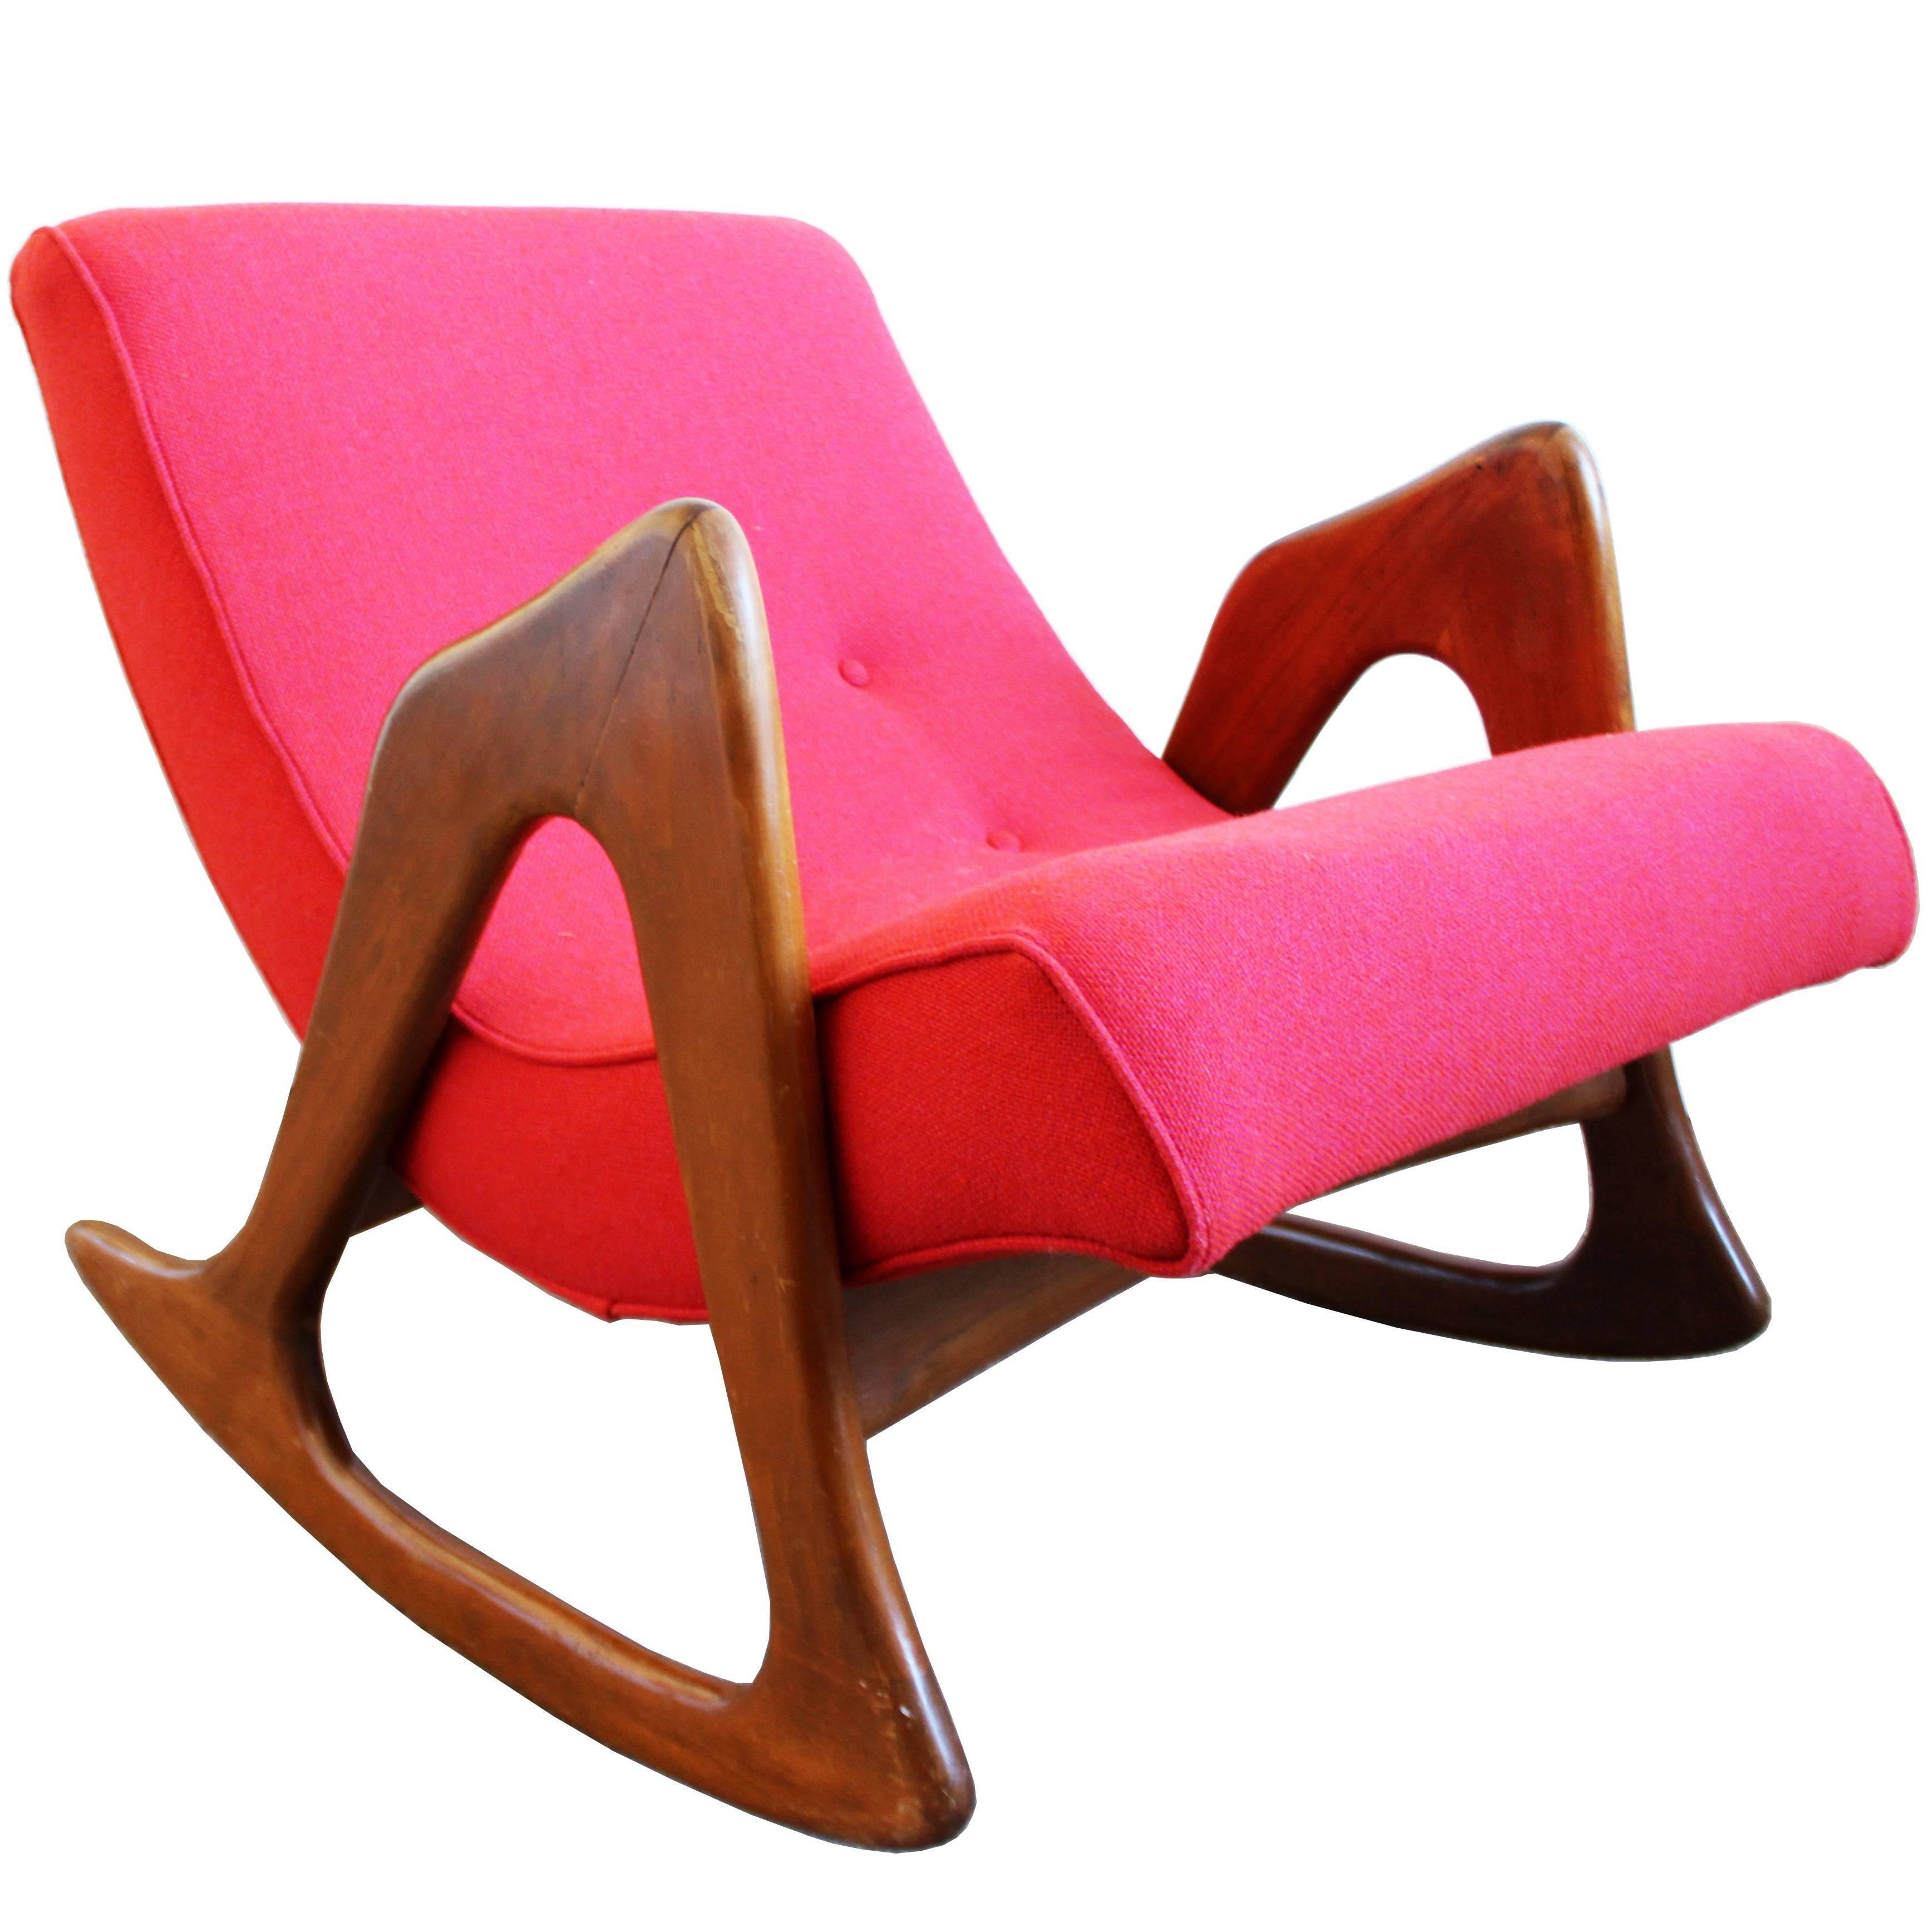 Mid Century Modern Adrian Pearsall Sculptural Walnut Rocker Lounge Chair